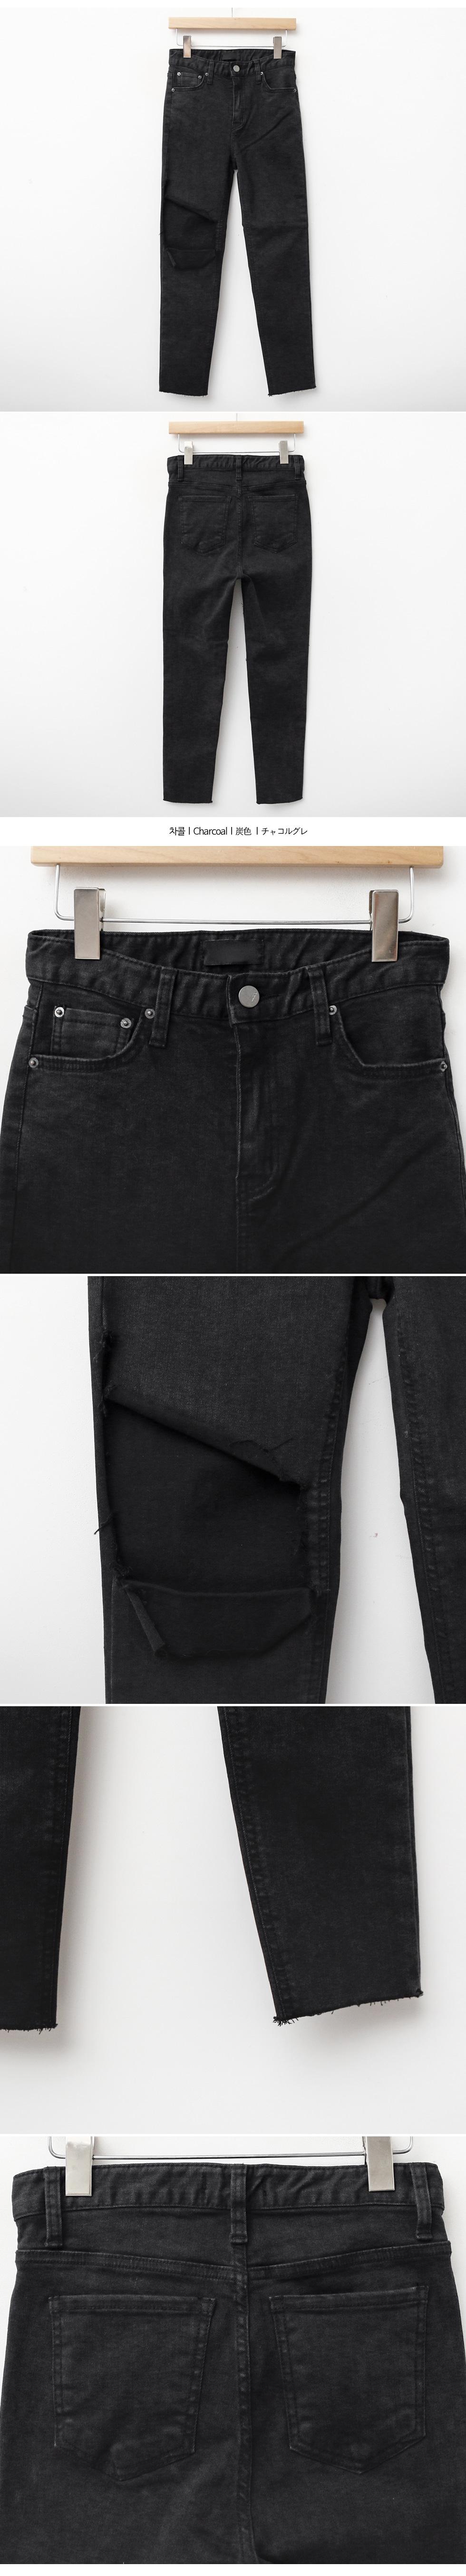 Buff-cutting denim pants